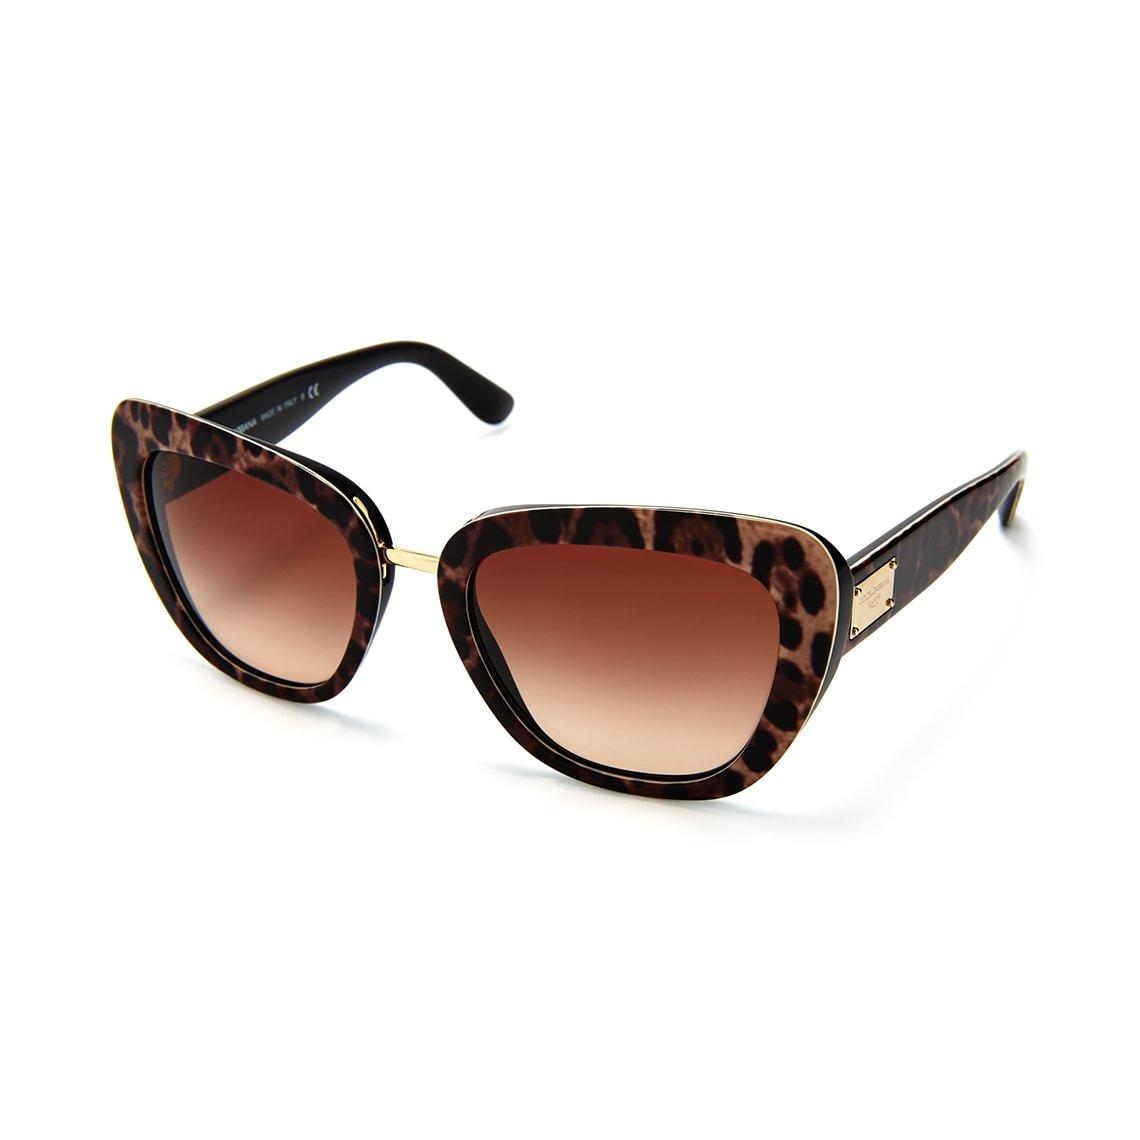 ffe6da70d0d3 Dolce   Gabbana DG4296 199513 5320 - Profil Optik